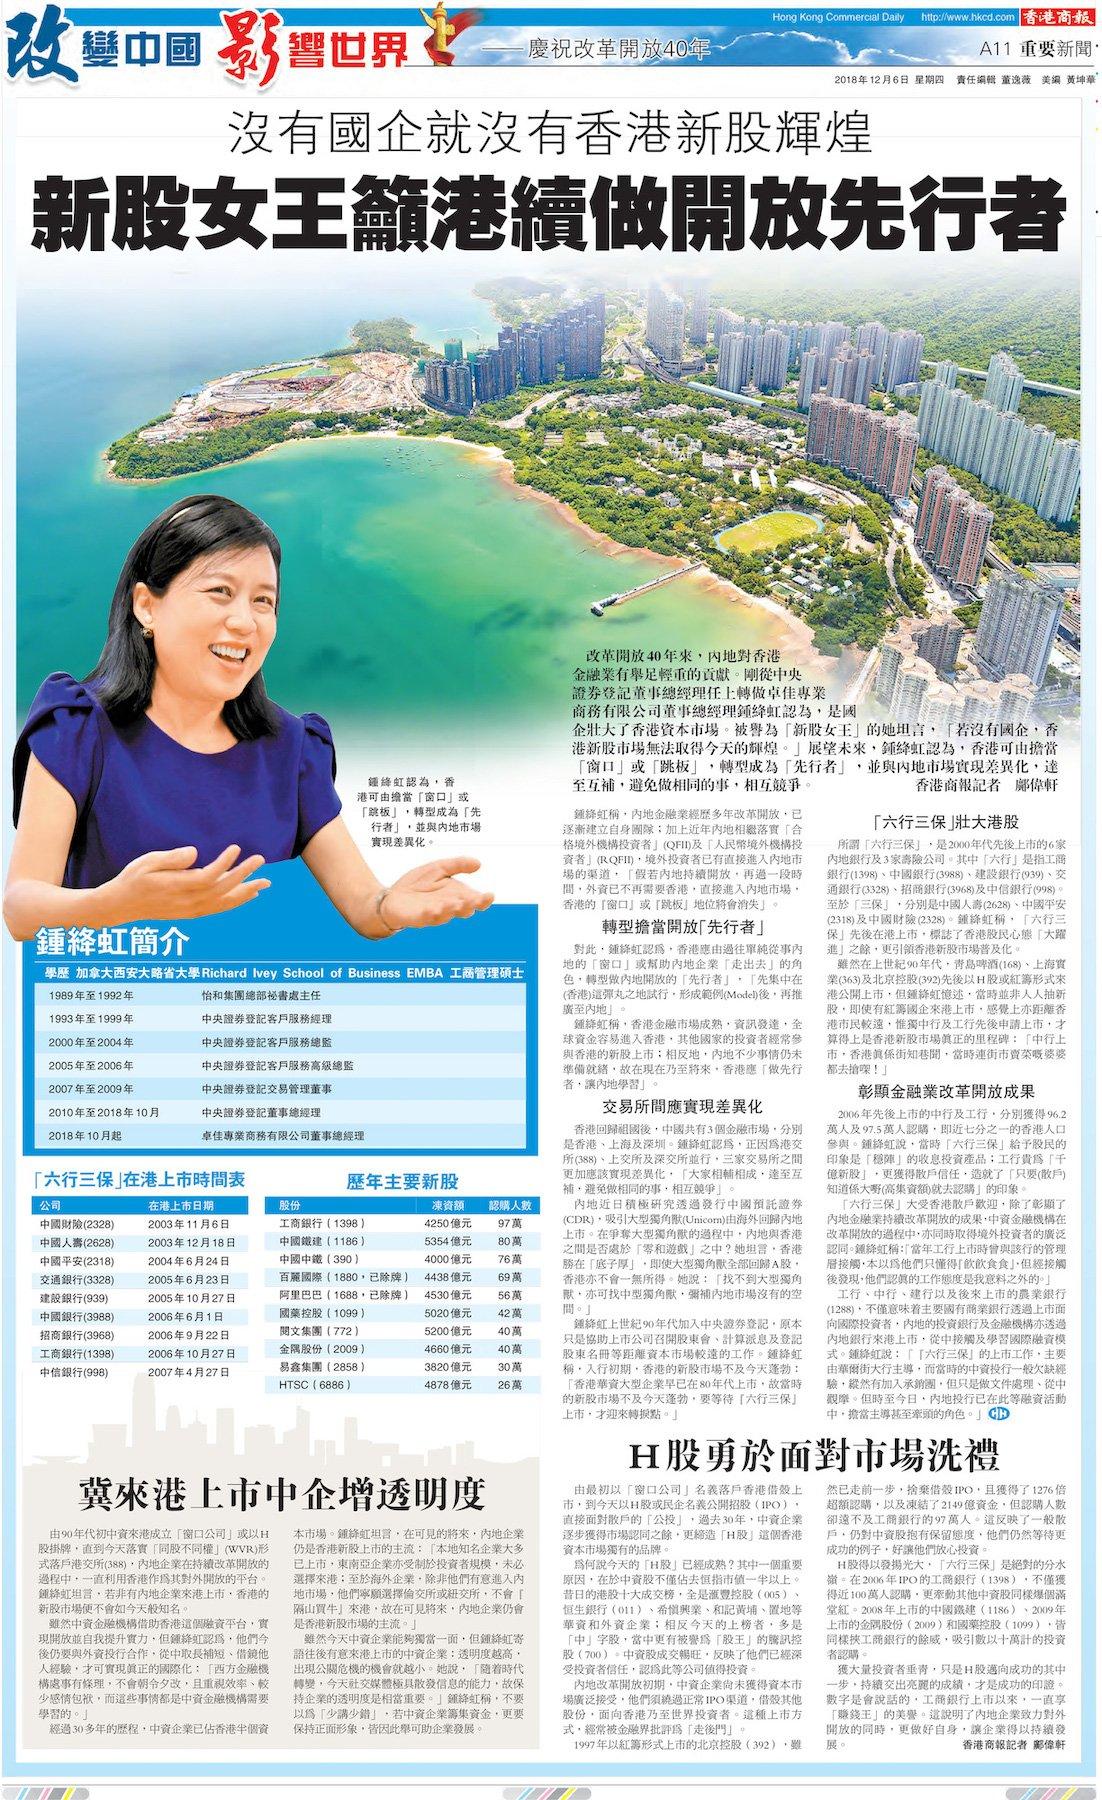 Pamela-Chung-HA11c06CGCC